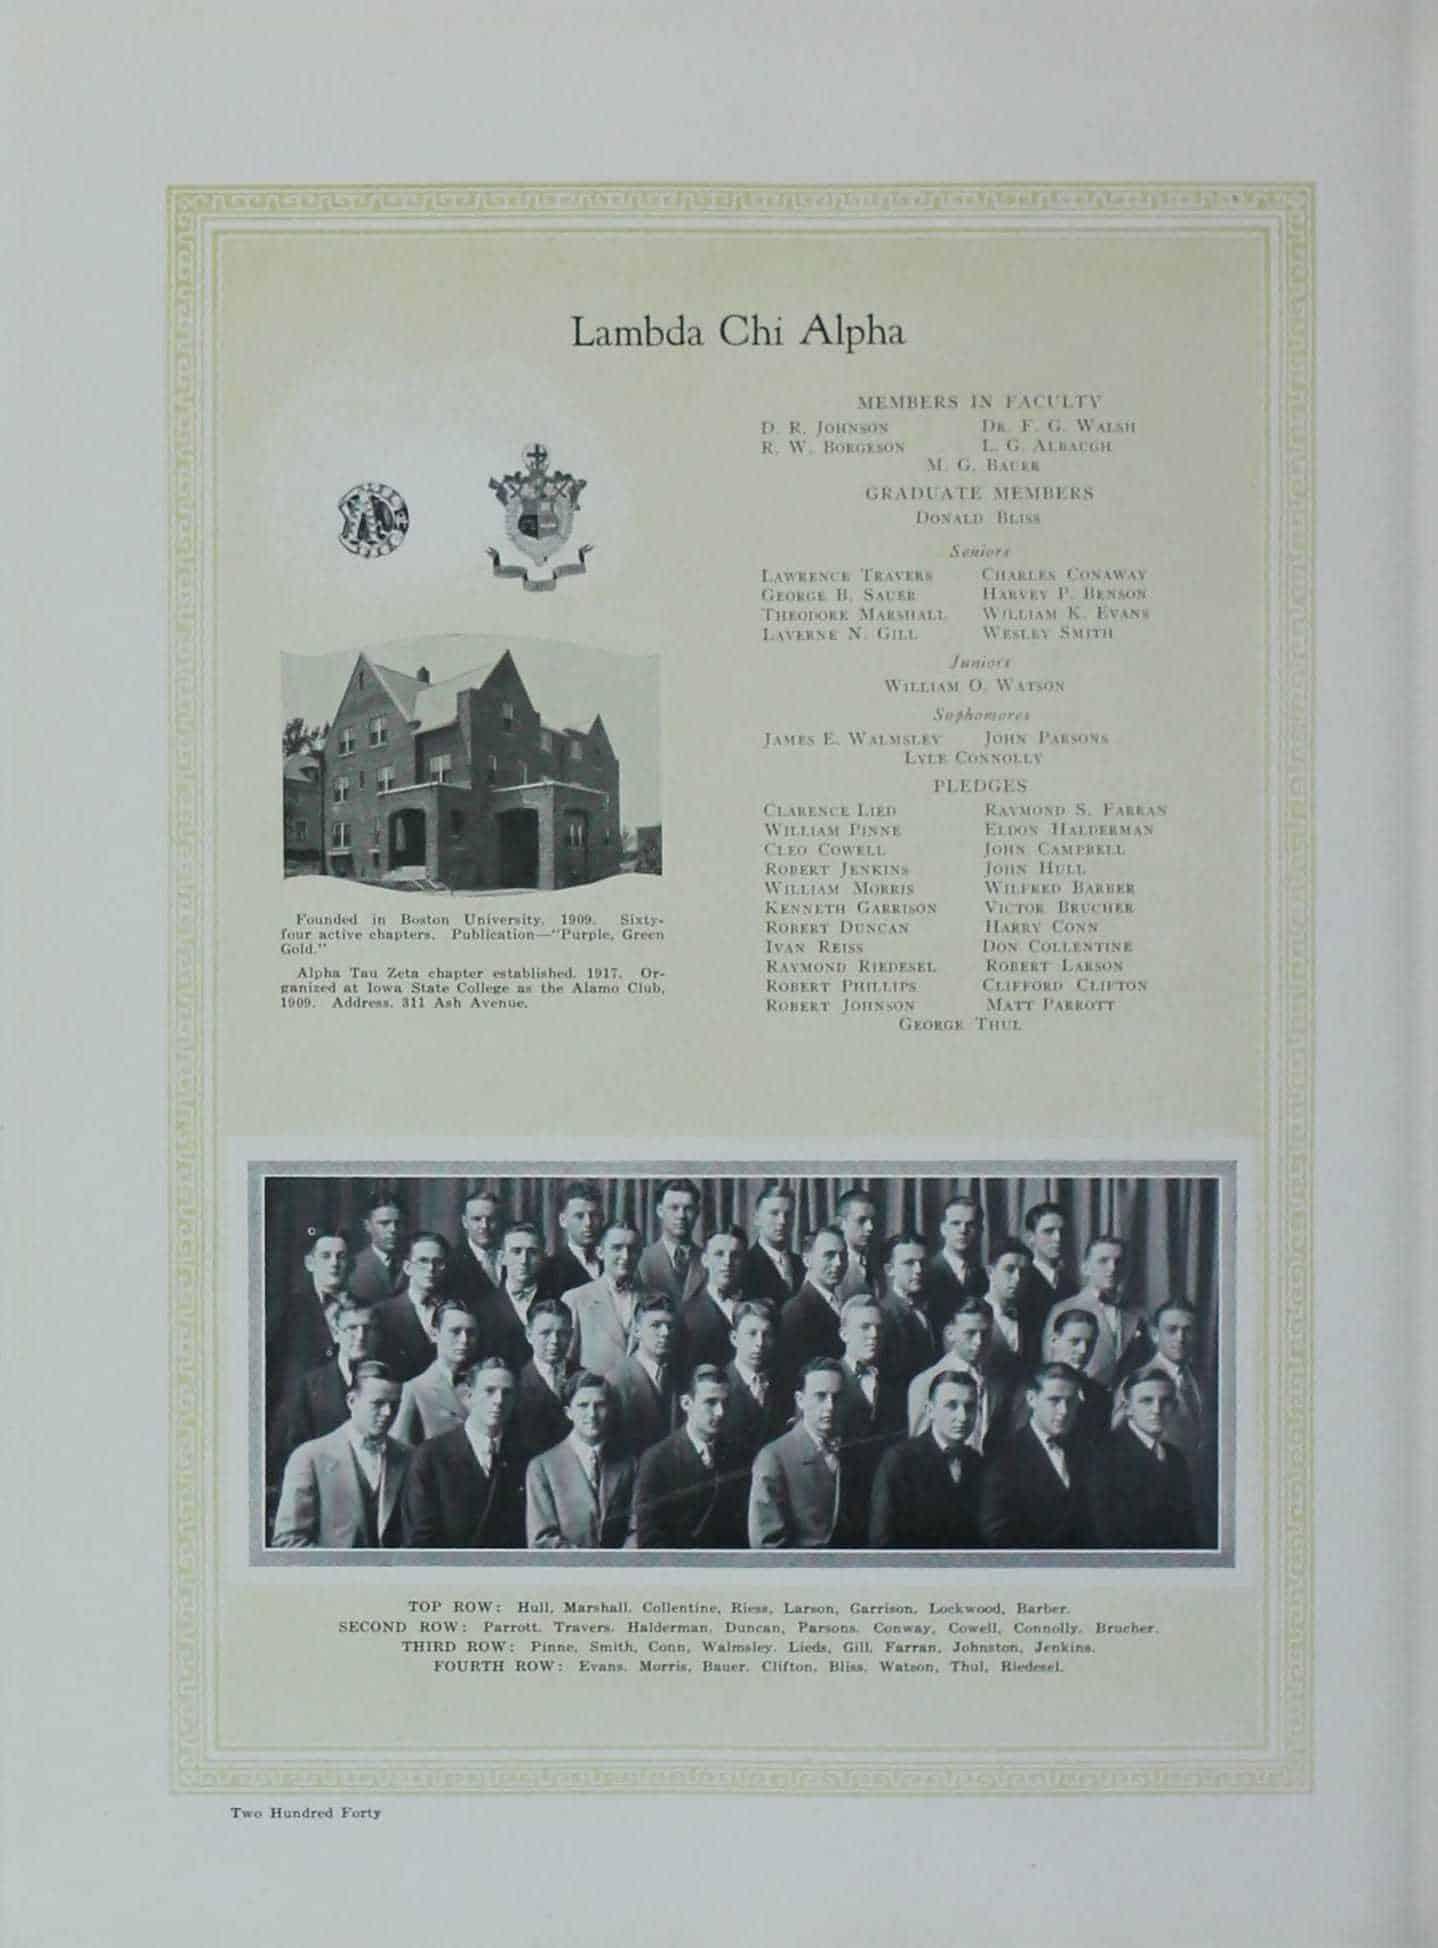 1927 Lambda Chi Alpha